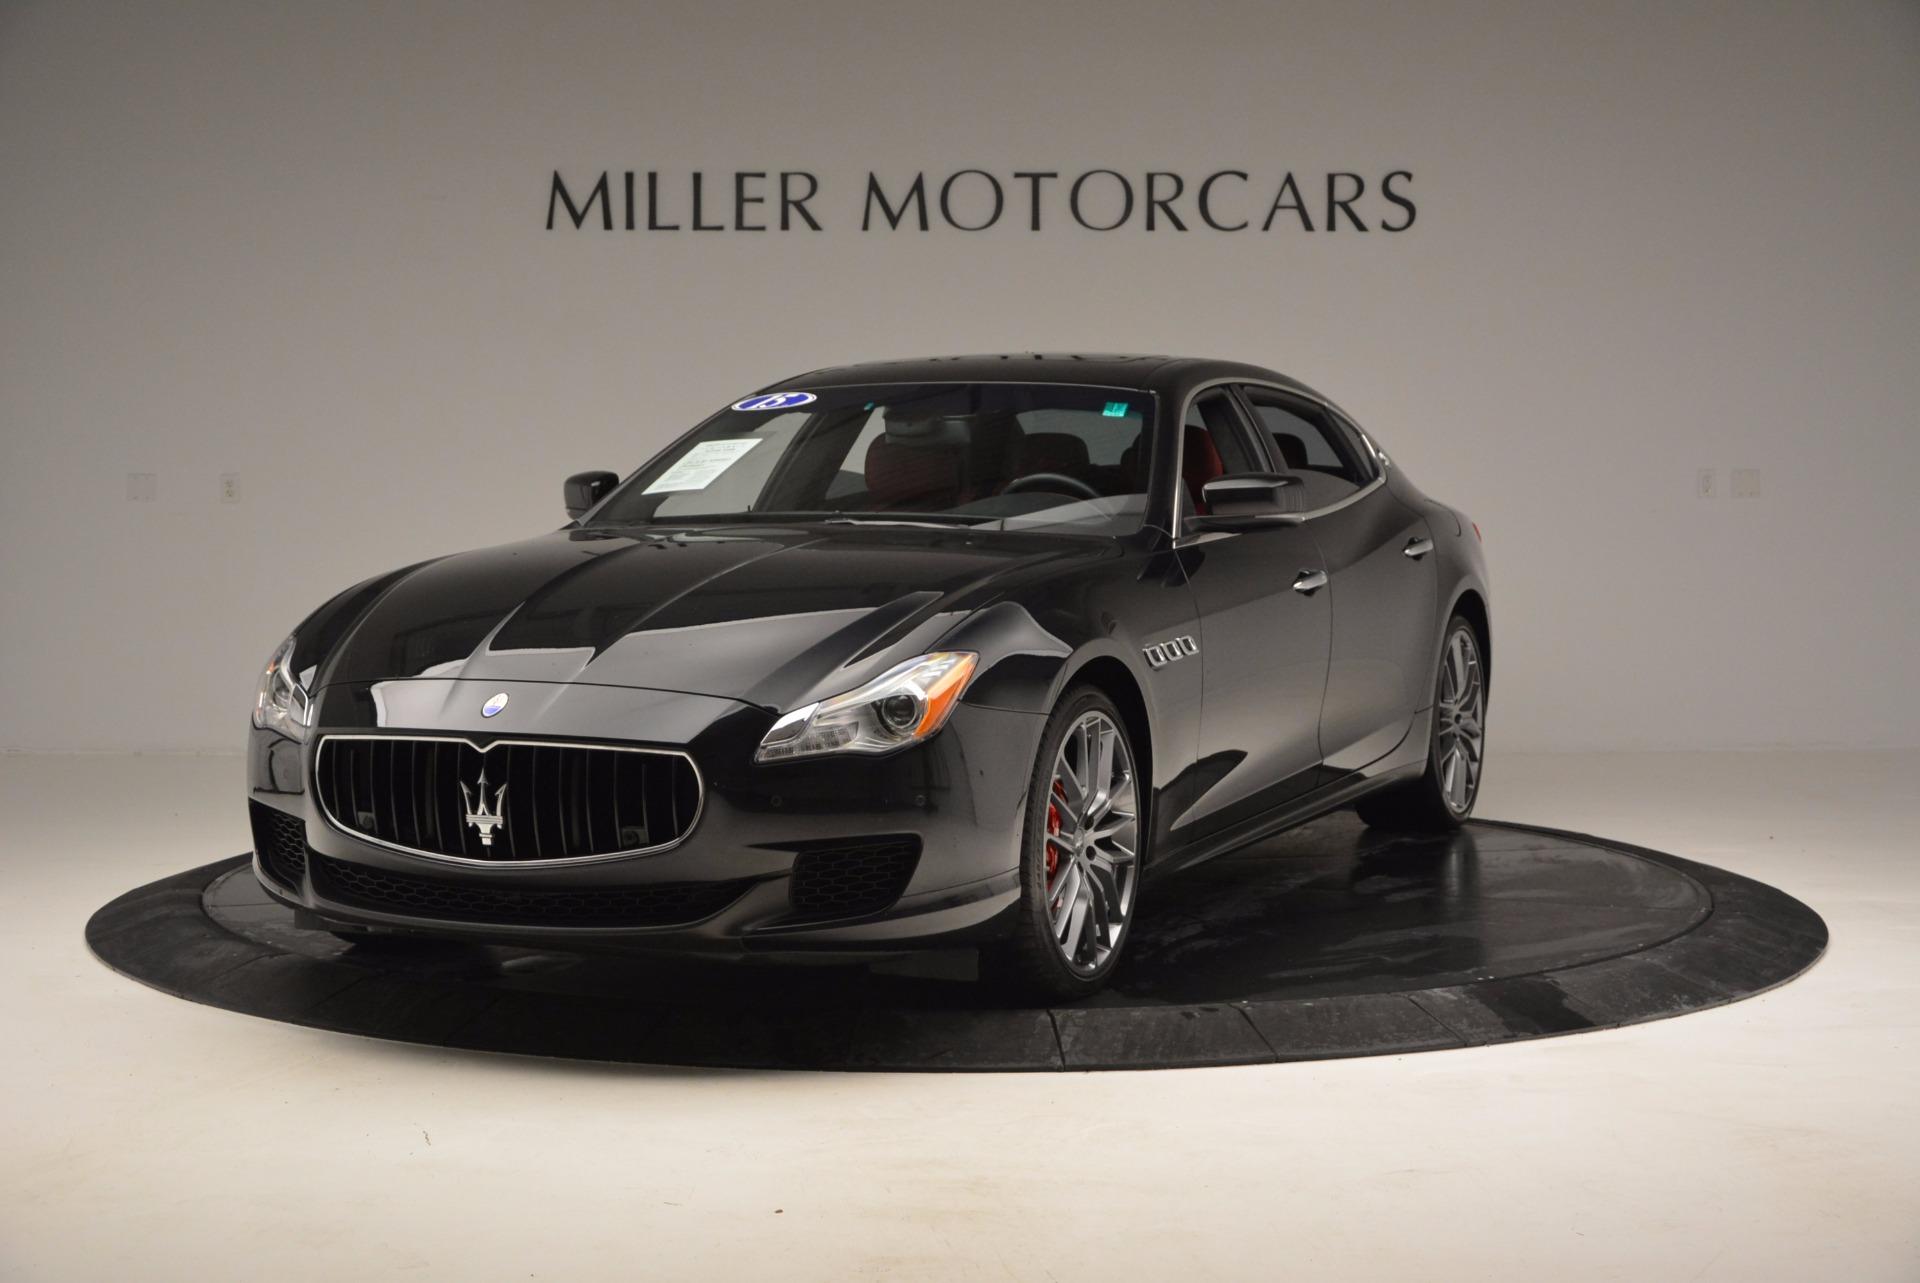 Used 2015 Maserati Quattroporte S Q4 for sale Sold at Aston Martin of Greenwich in Greenwich CT 06830 1